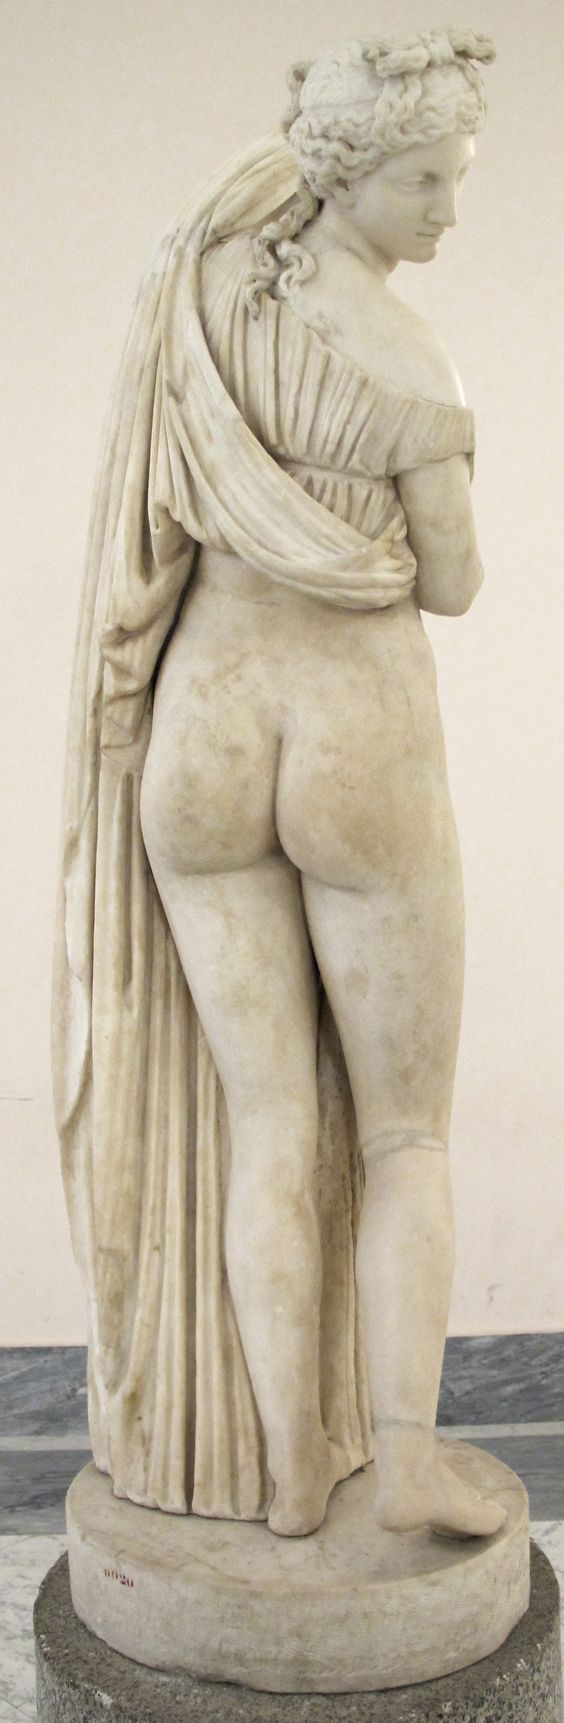 Venus Calipigia (copia de un original helenístico del siglo III a. n. e.)